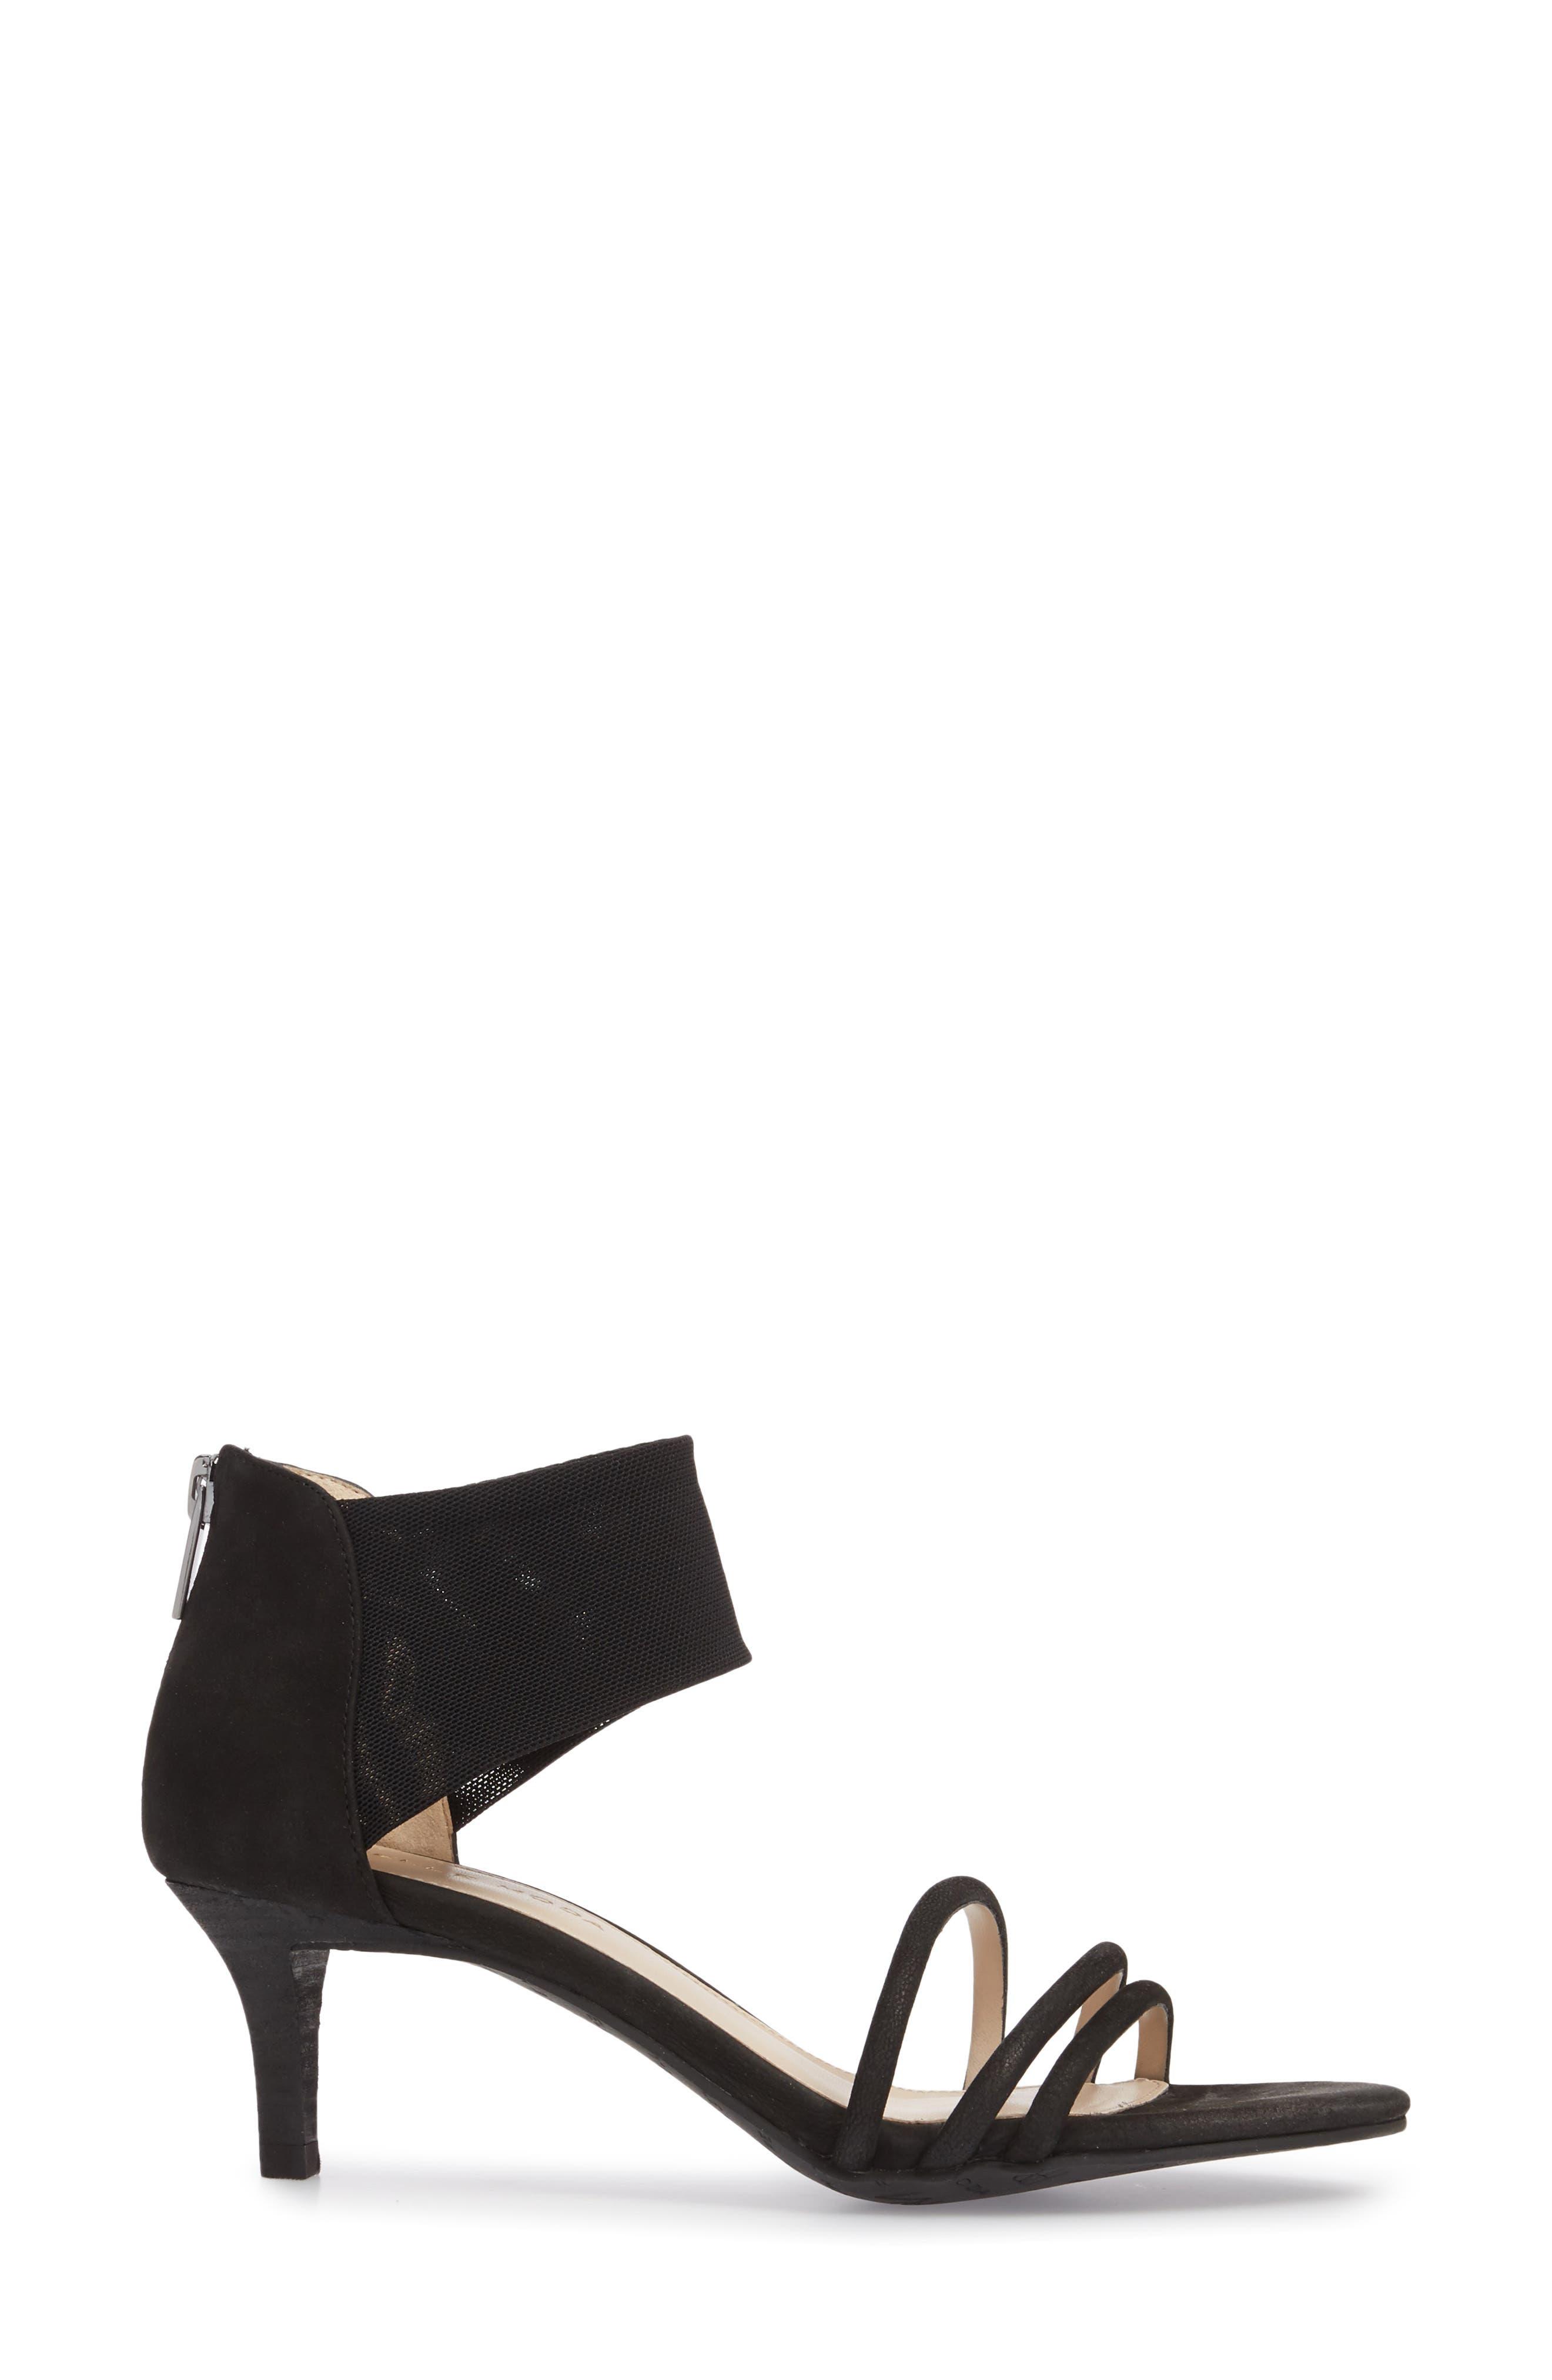 Berri Ankle Cuff Sandal,                             Alternate thumbnail 7, color,